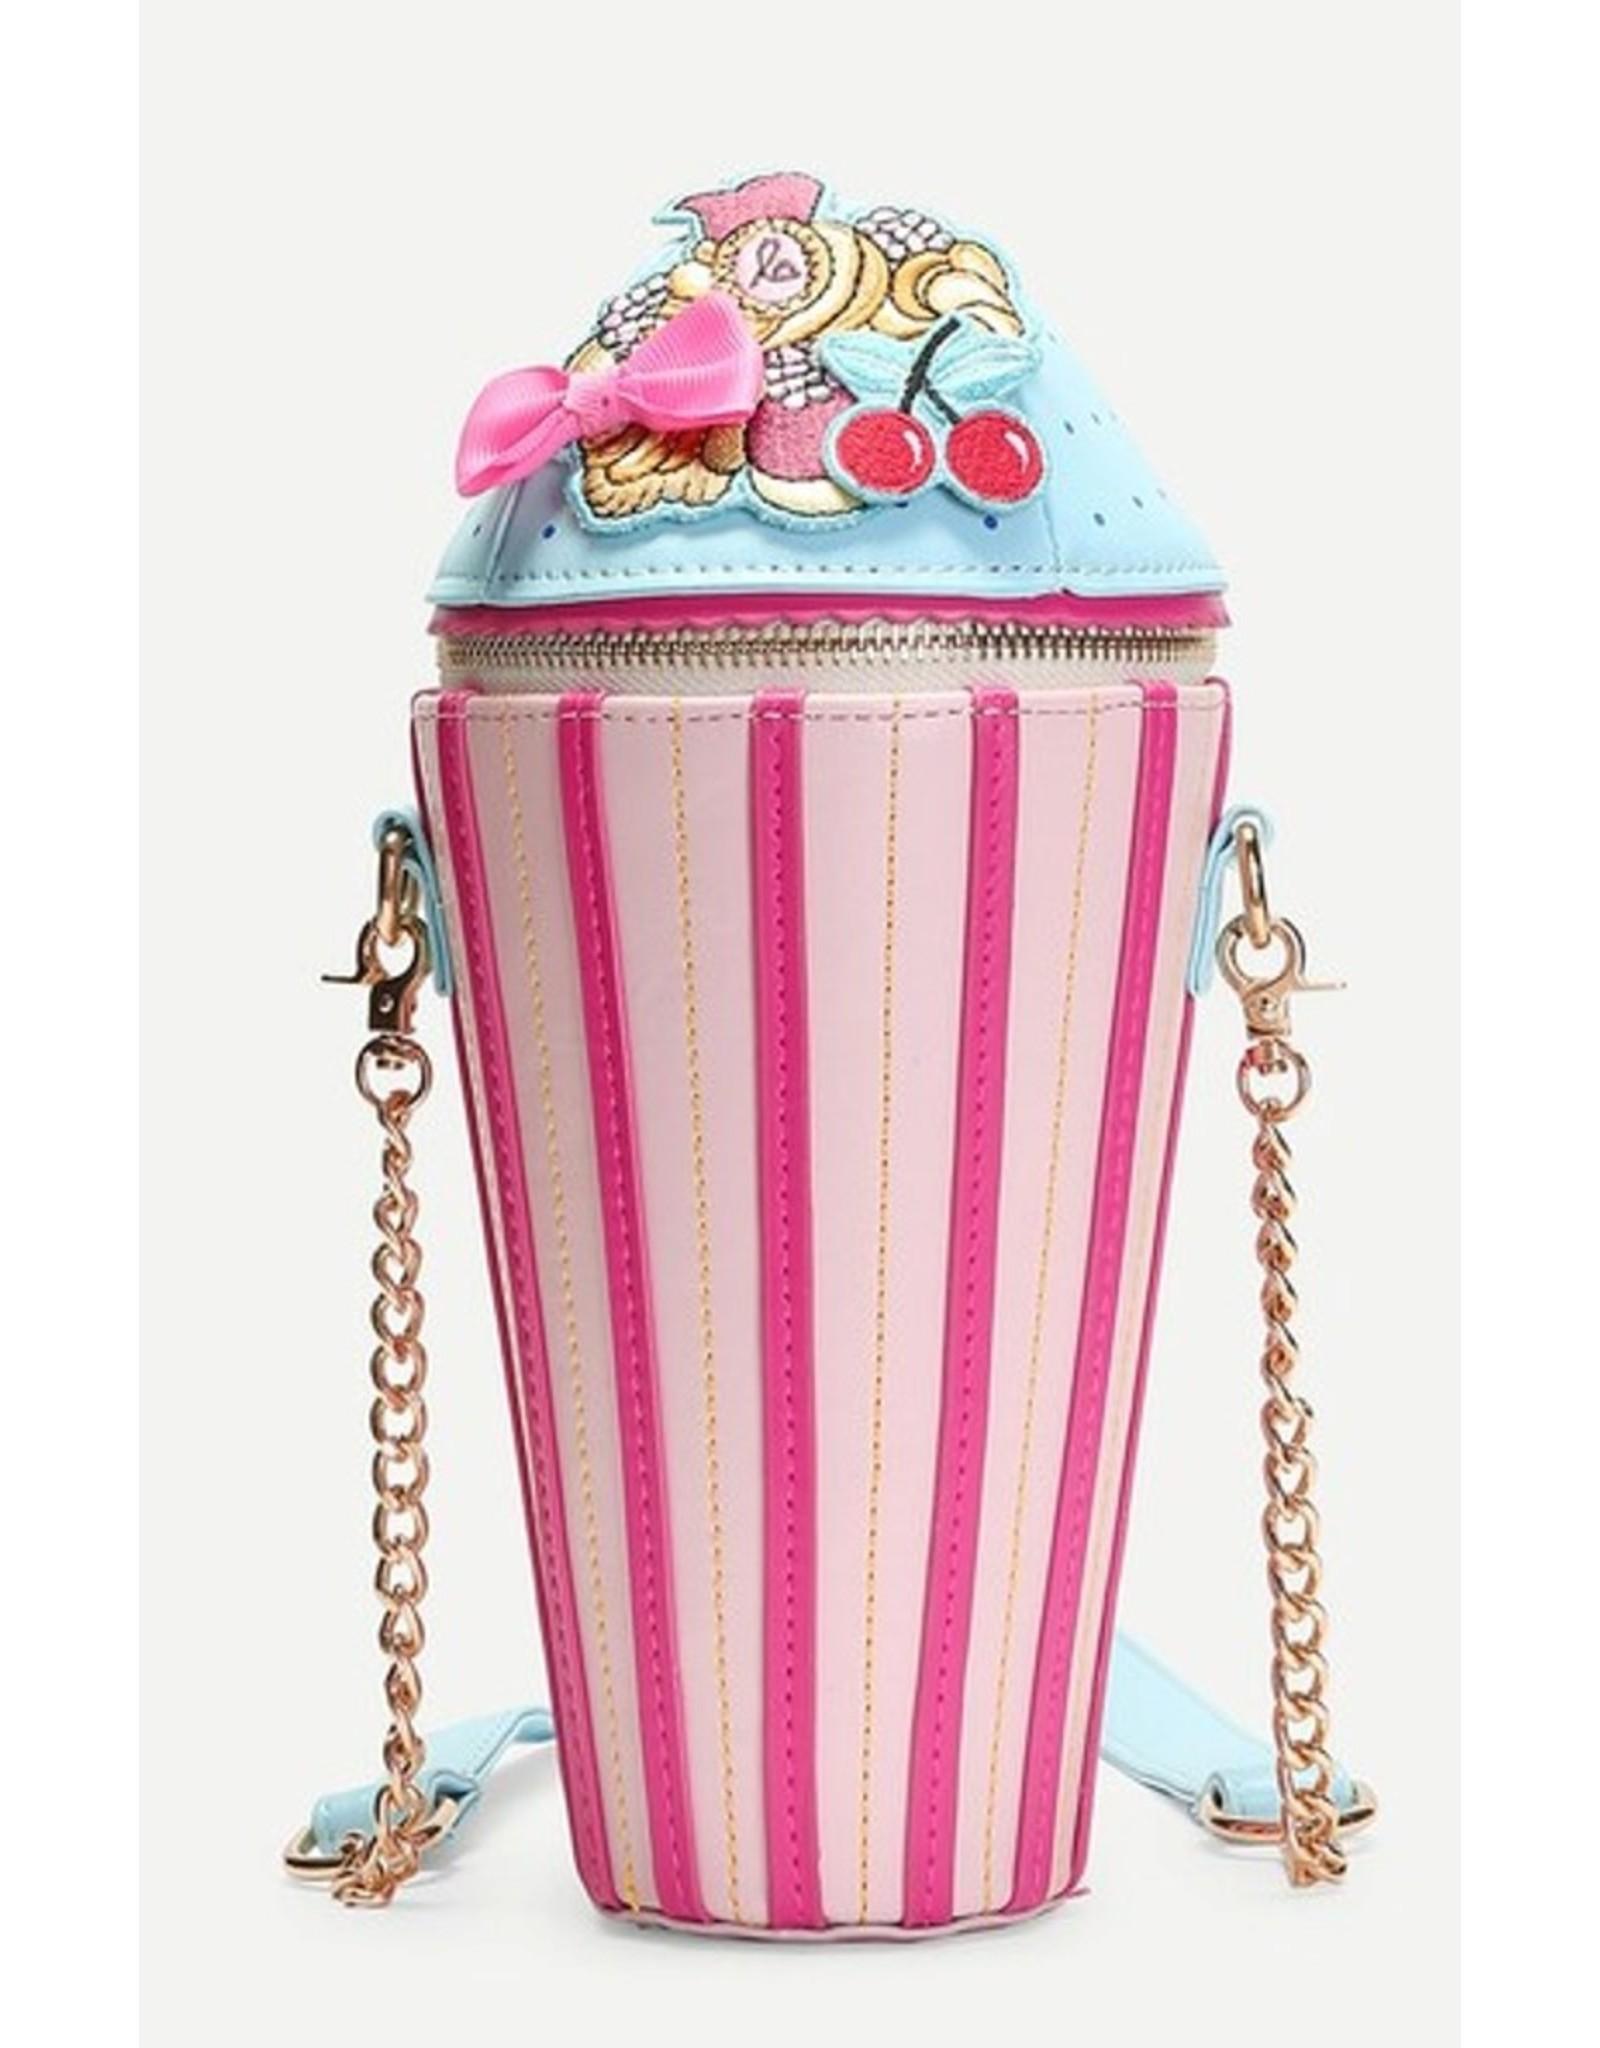 Magic Bags Fantasy bags and wallets - Fantasy bag Ice Cream